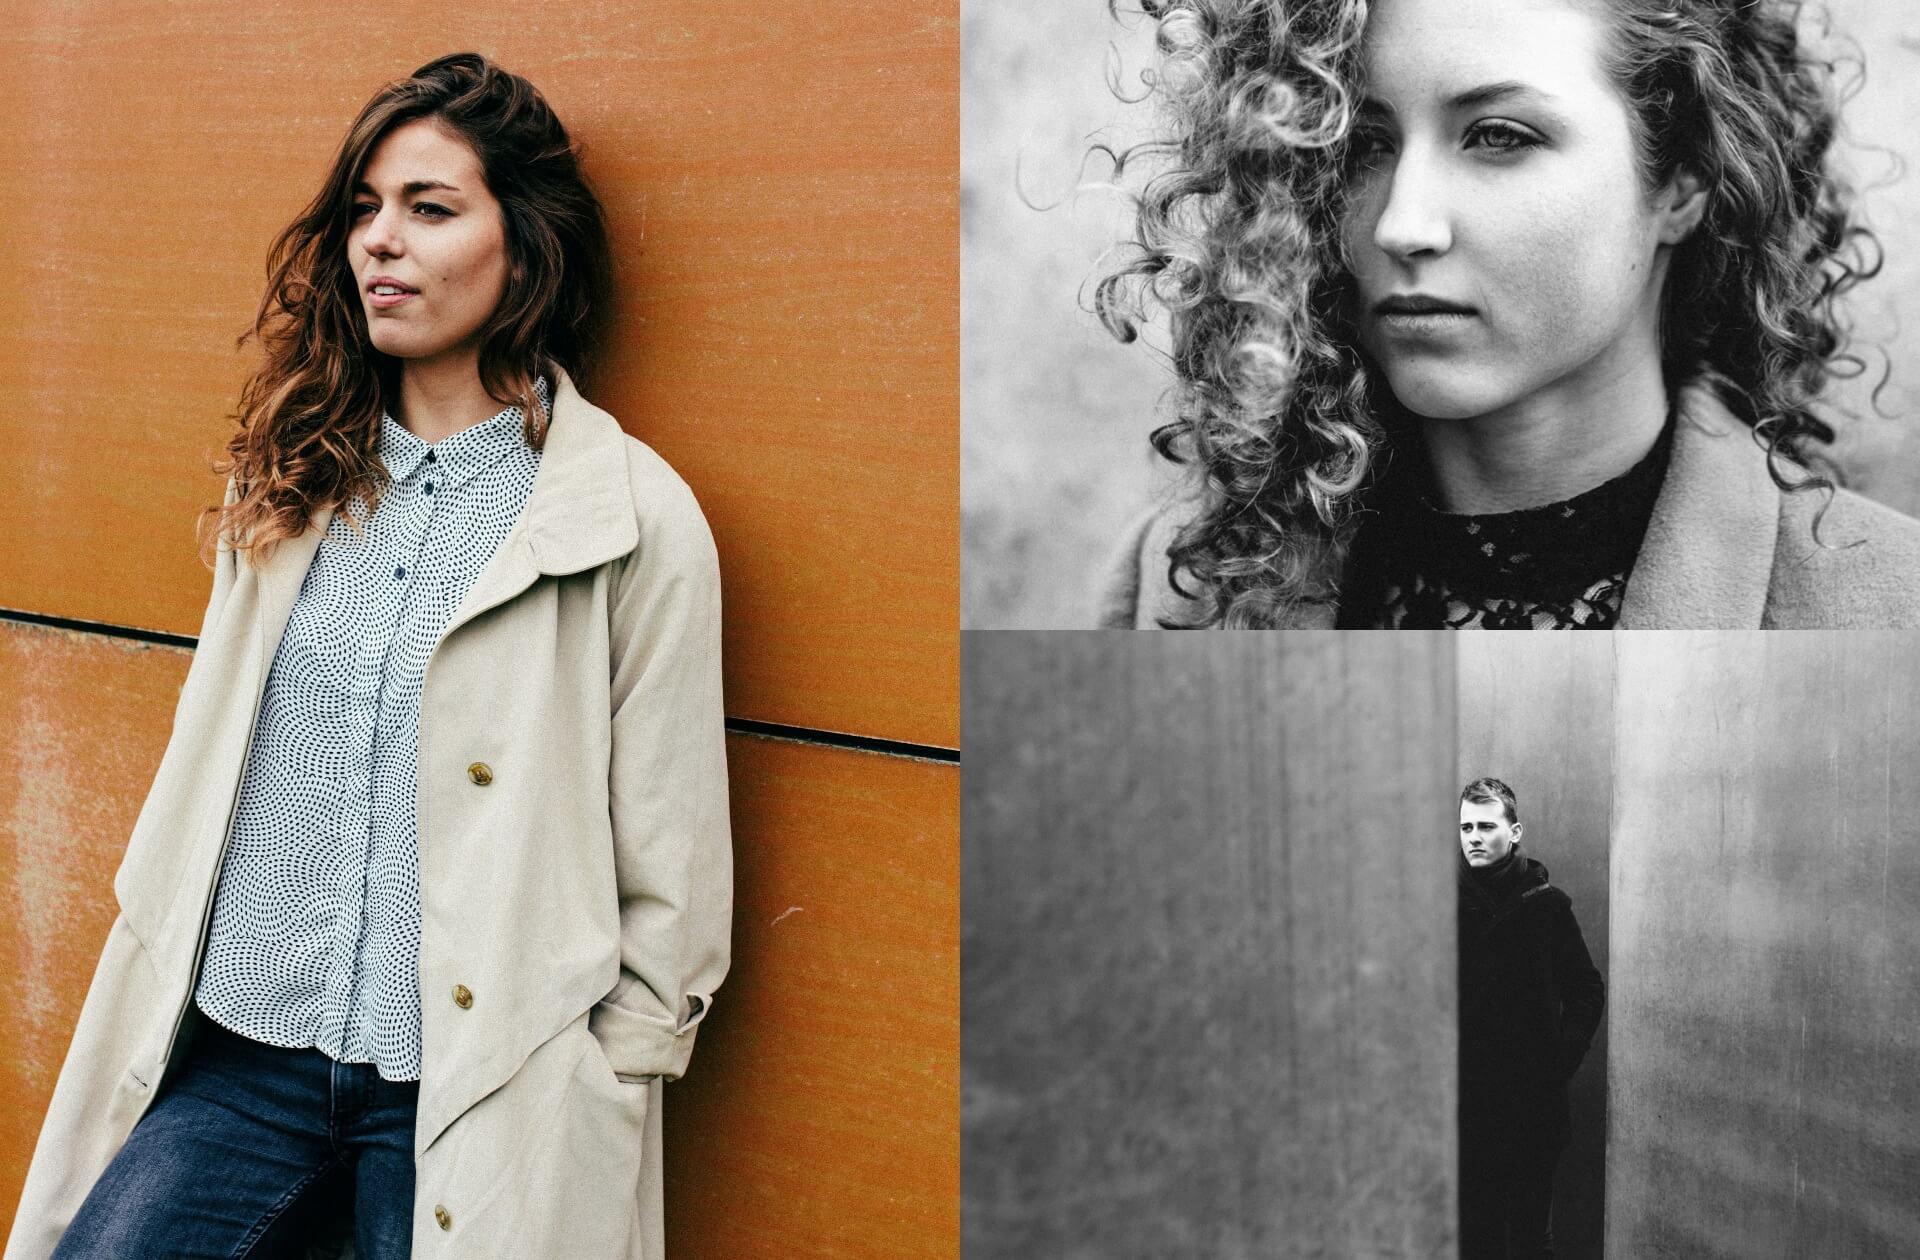 portret fashion fotografie nederland